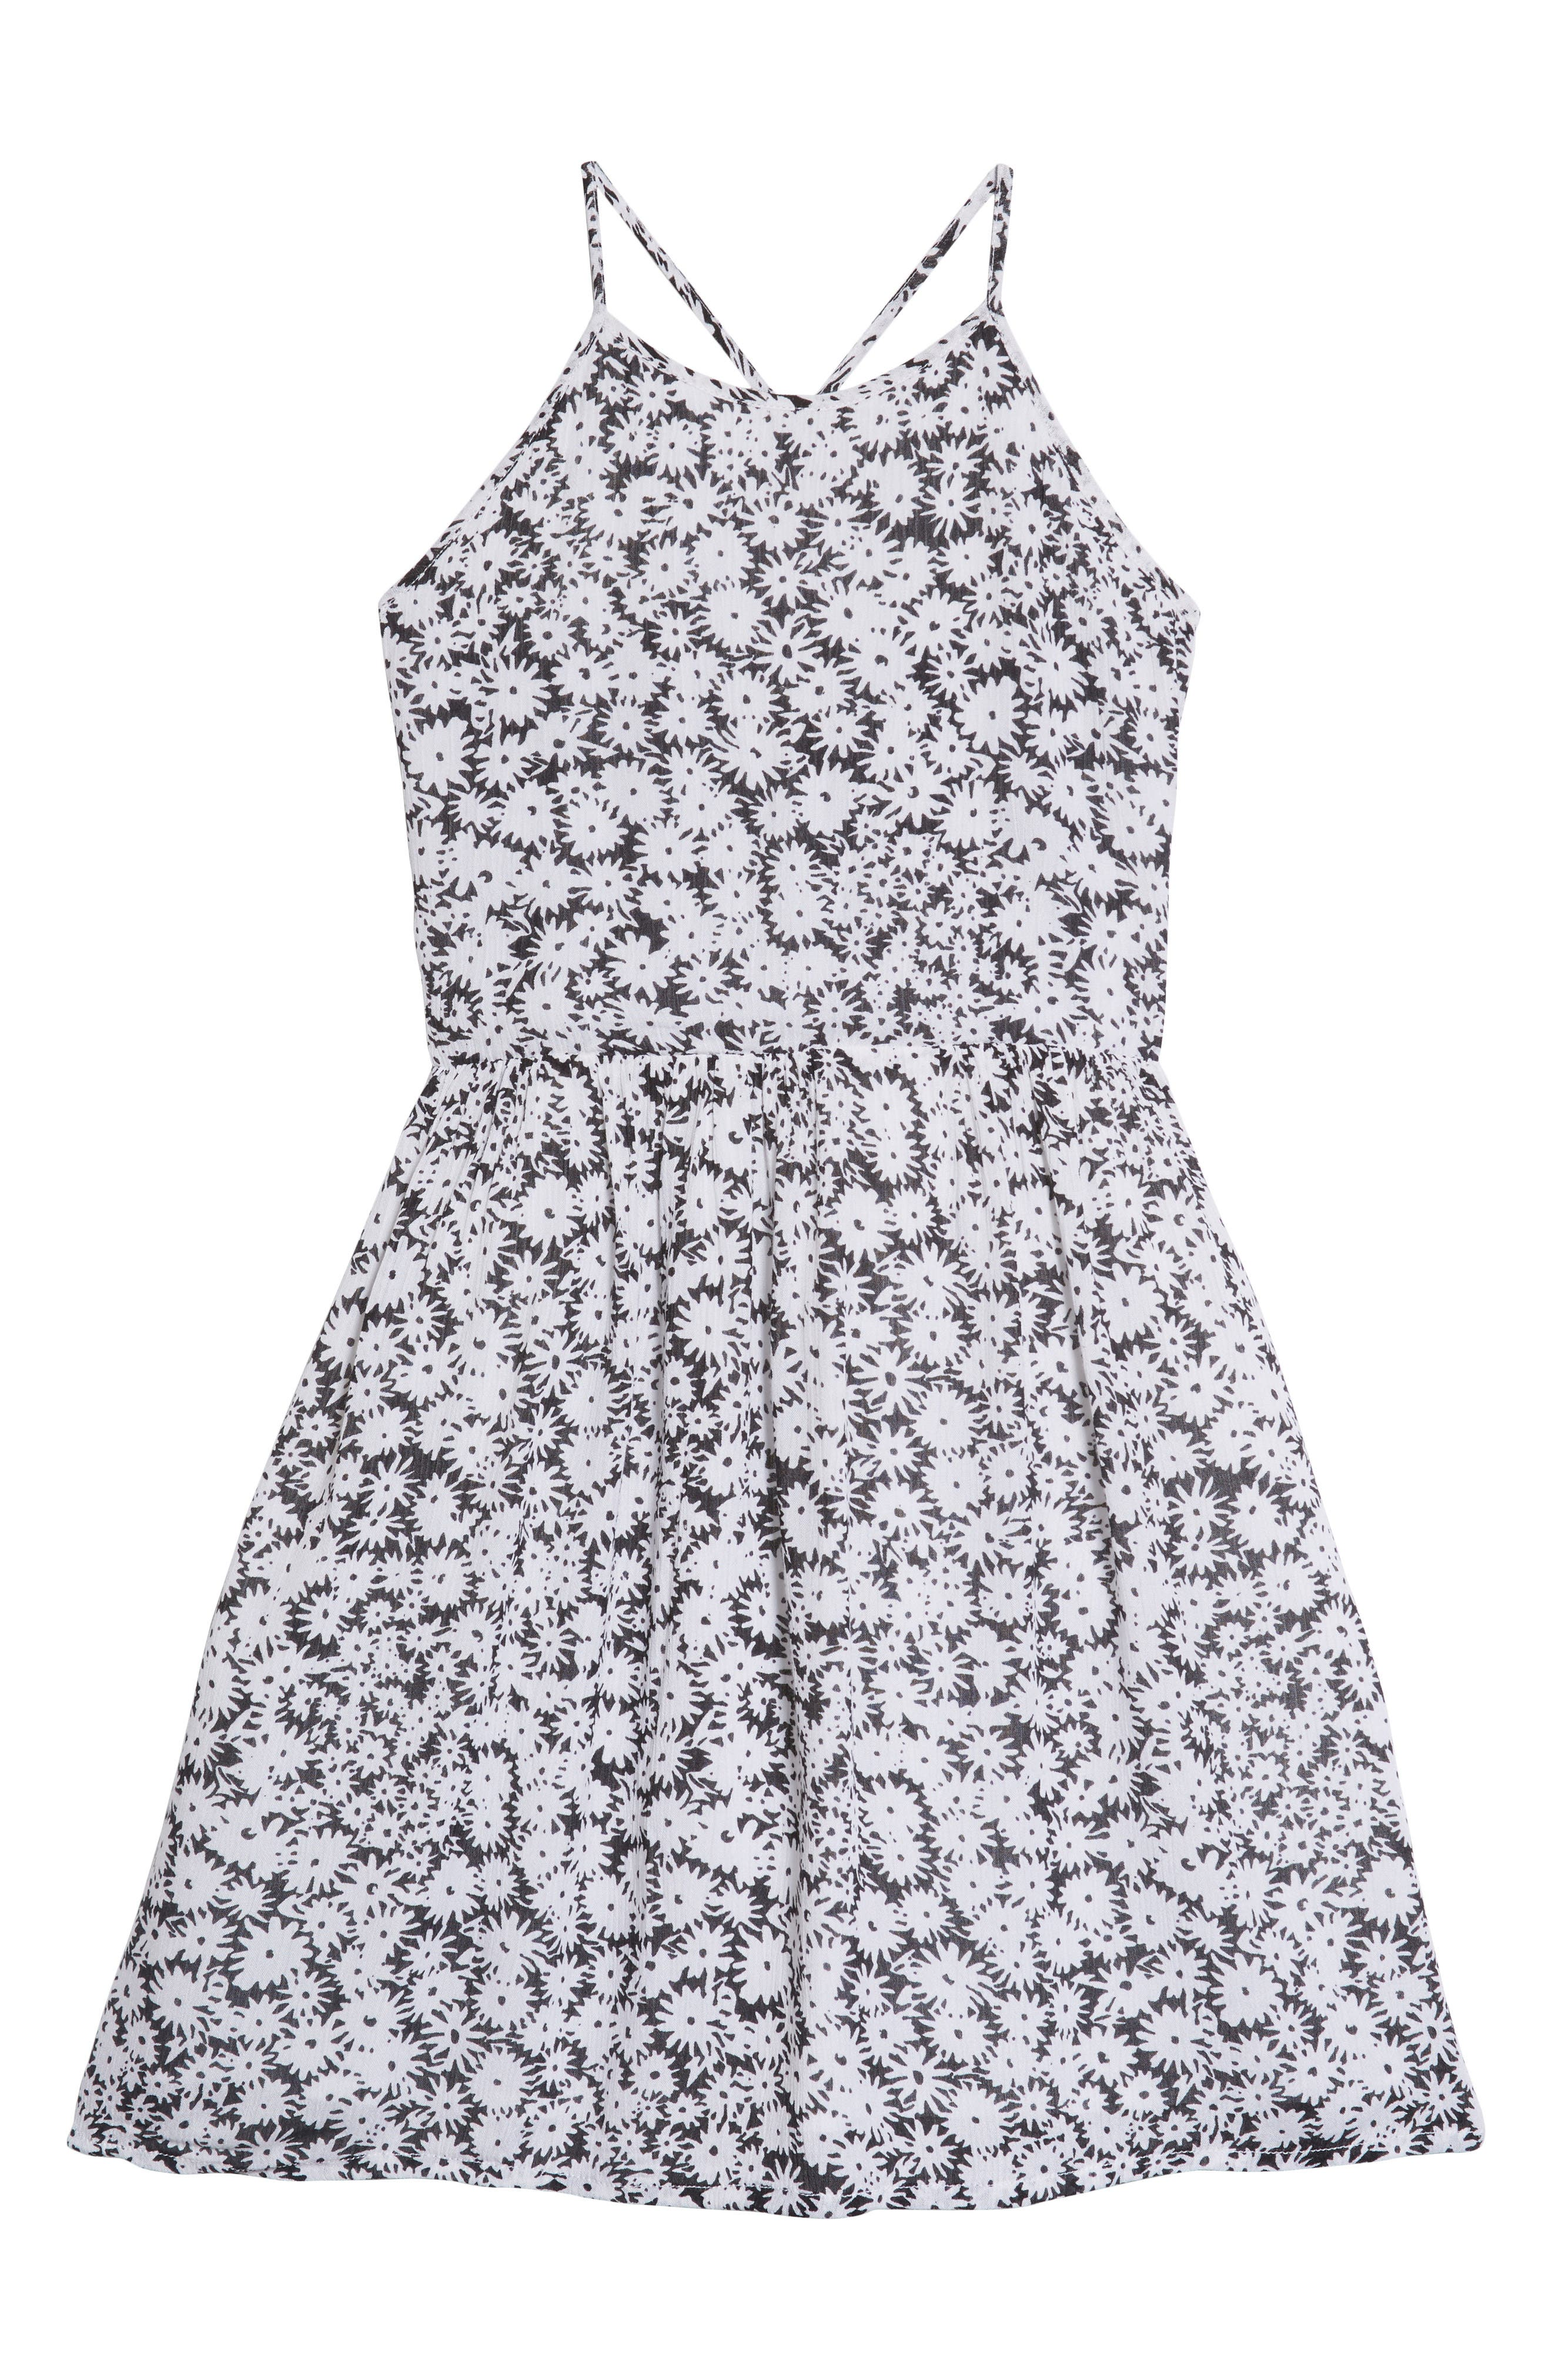 TUCKER + TATE,                             Smocked Dress,                             Main thumbnail 1, color,                             001